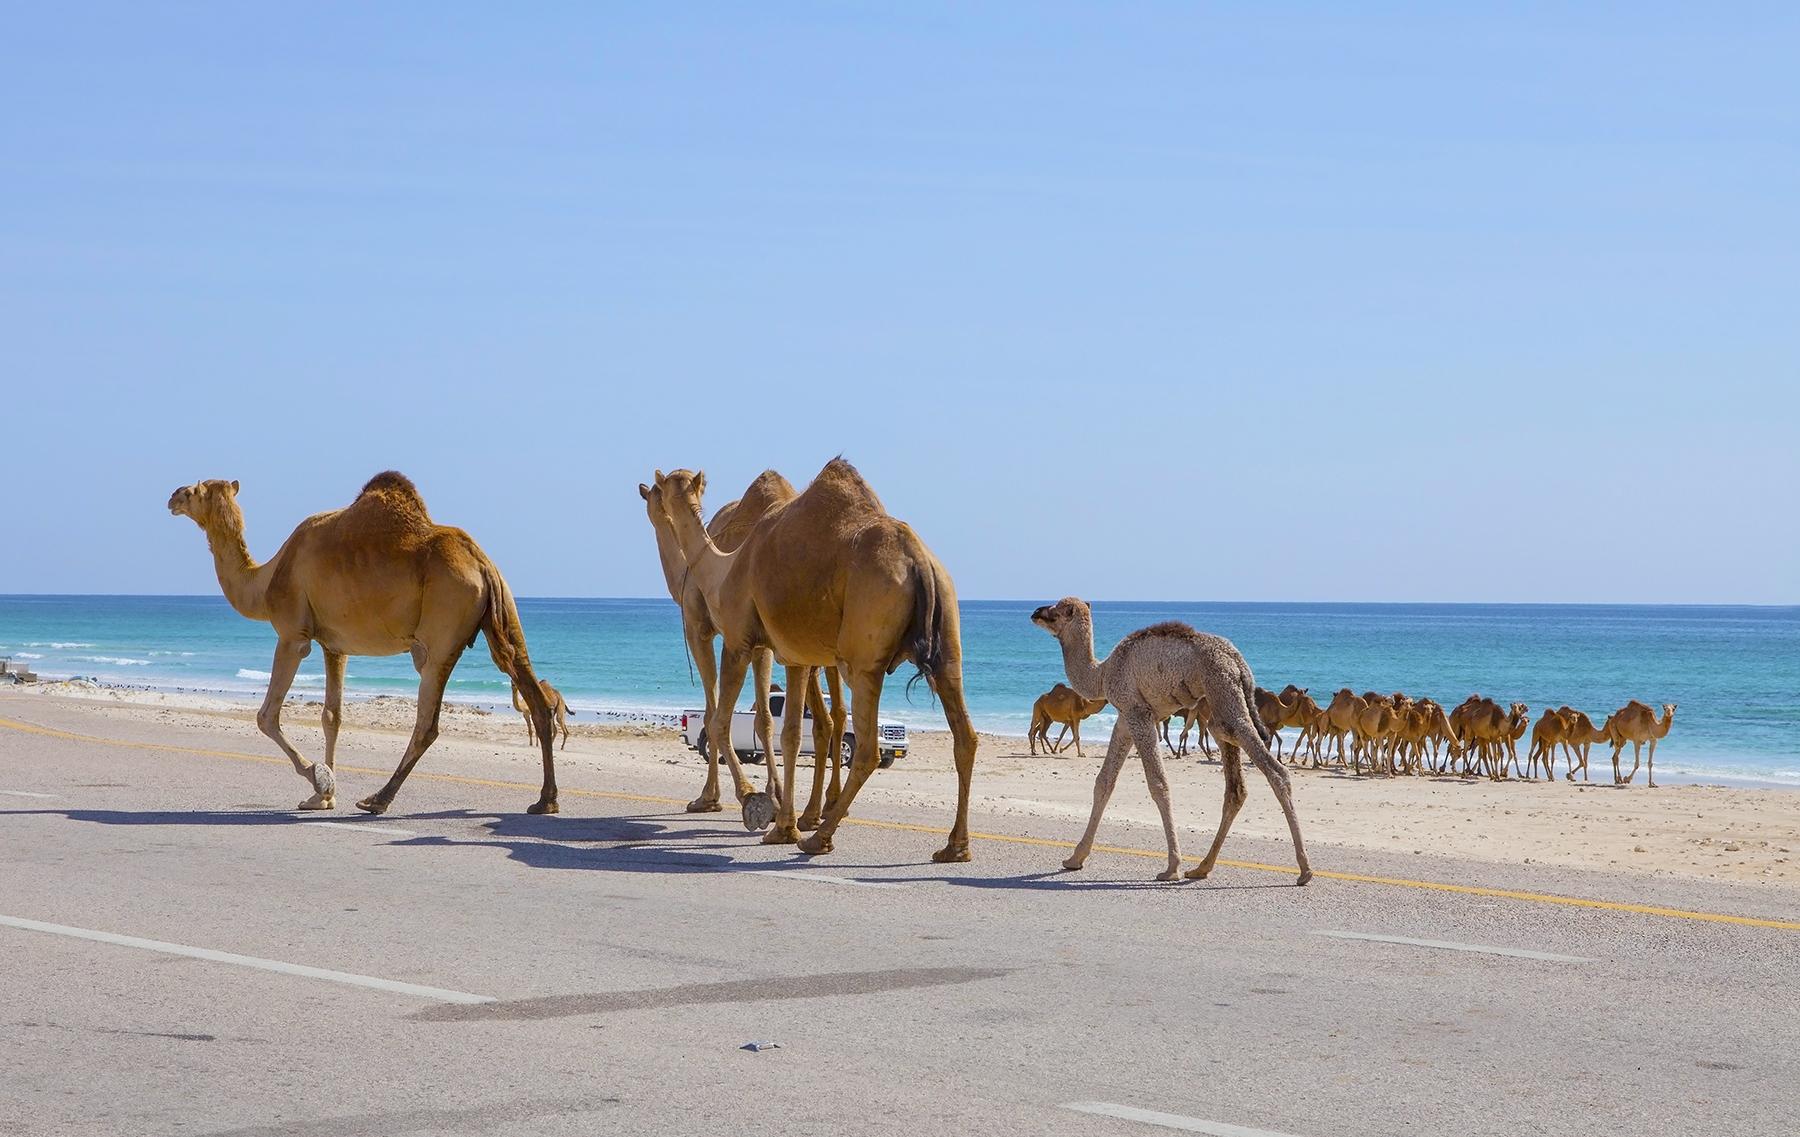 1800_oman_bigstock-Camels-116247146.jpg